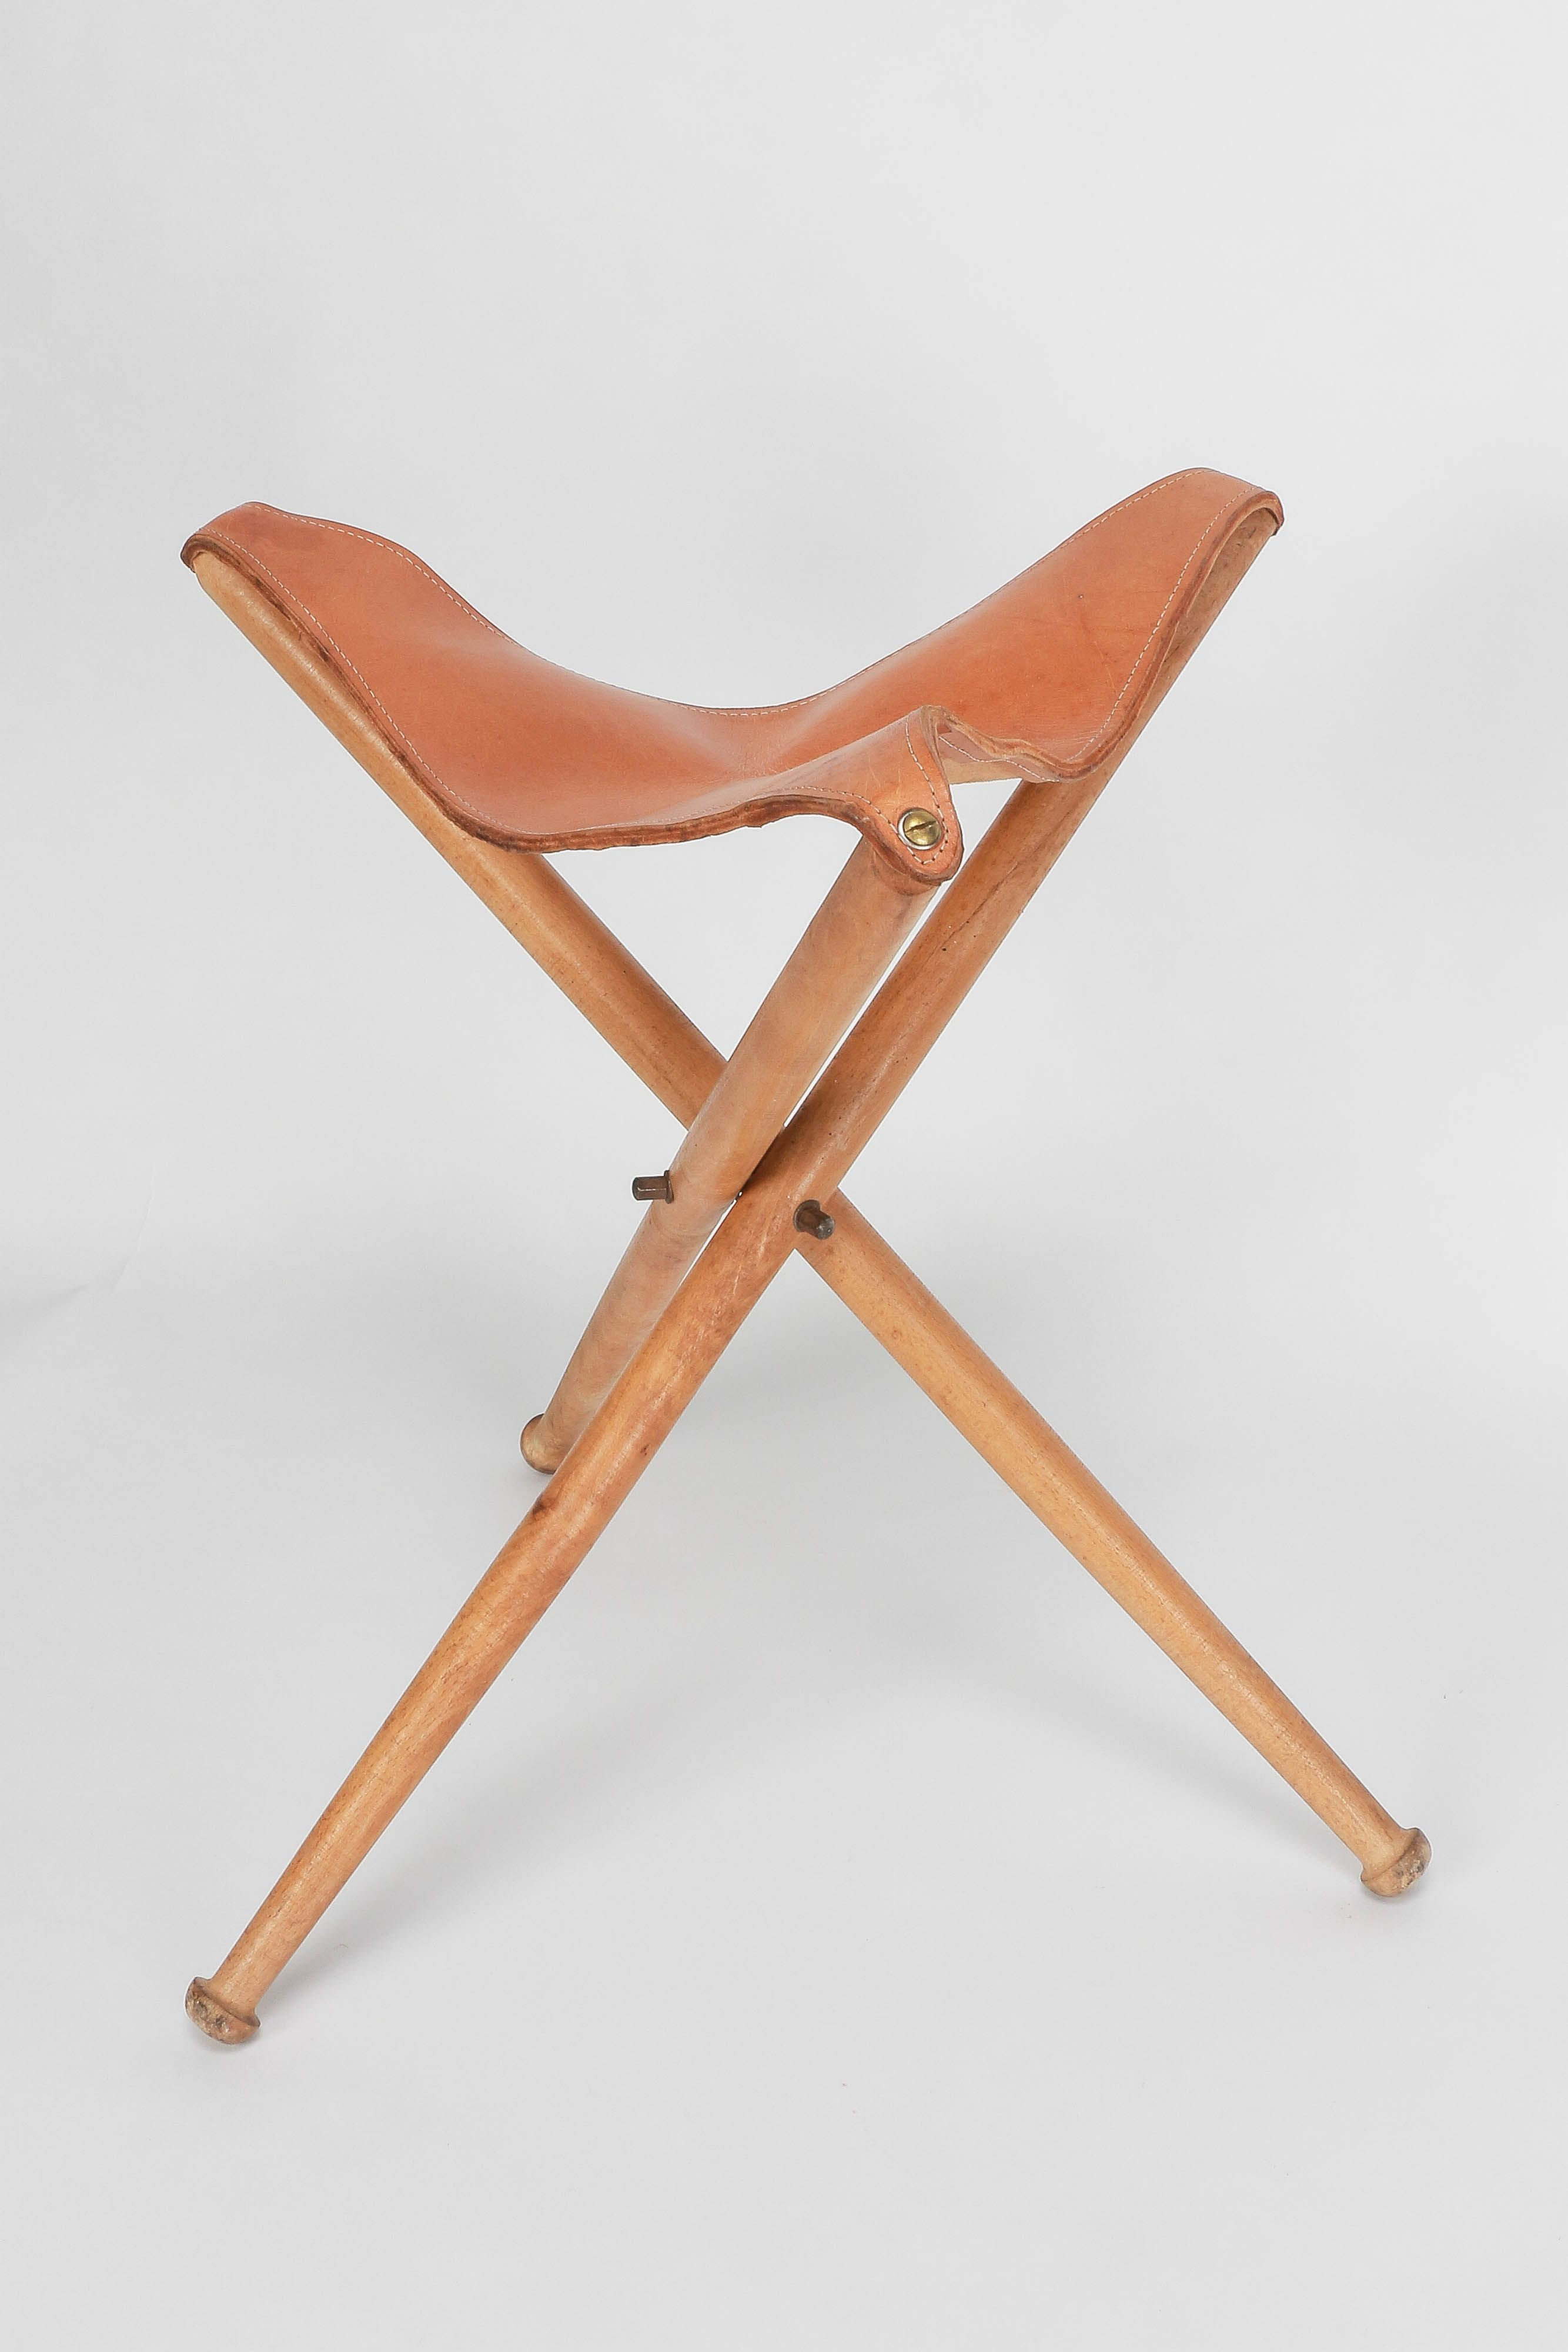 Tripod Hunting Stool Leather 40 s Okay Art furniture